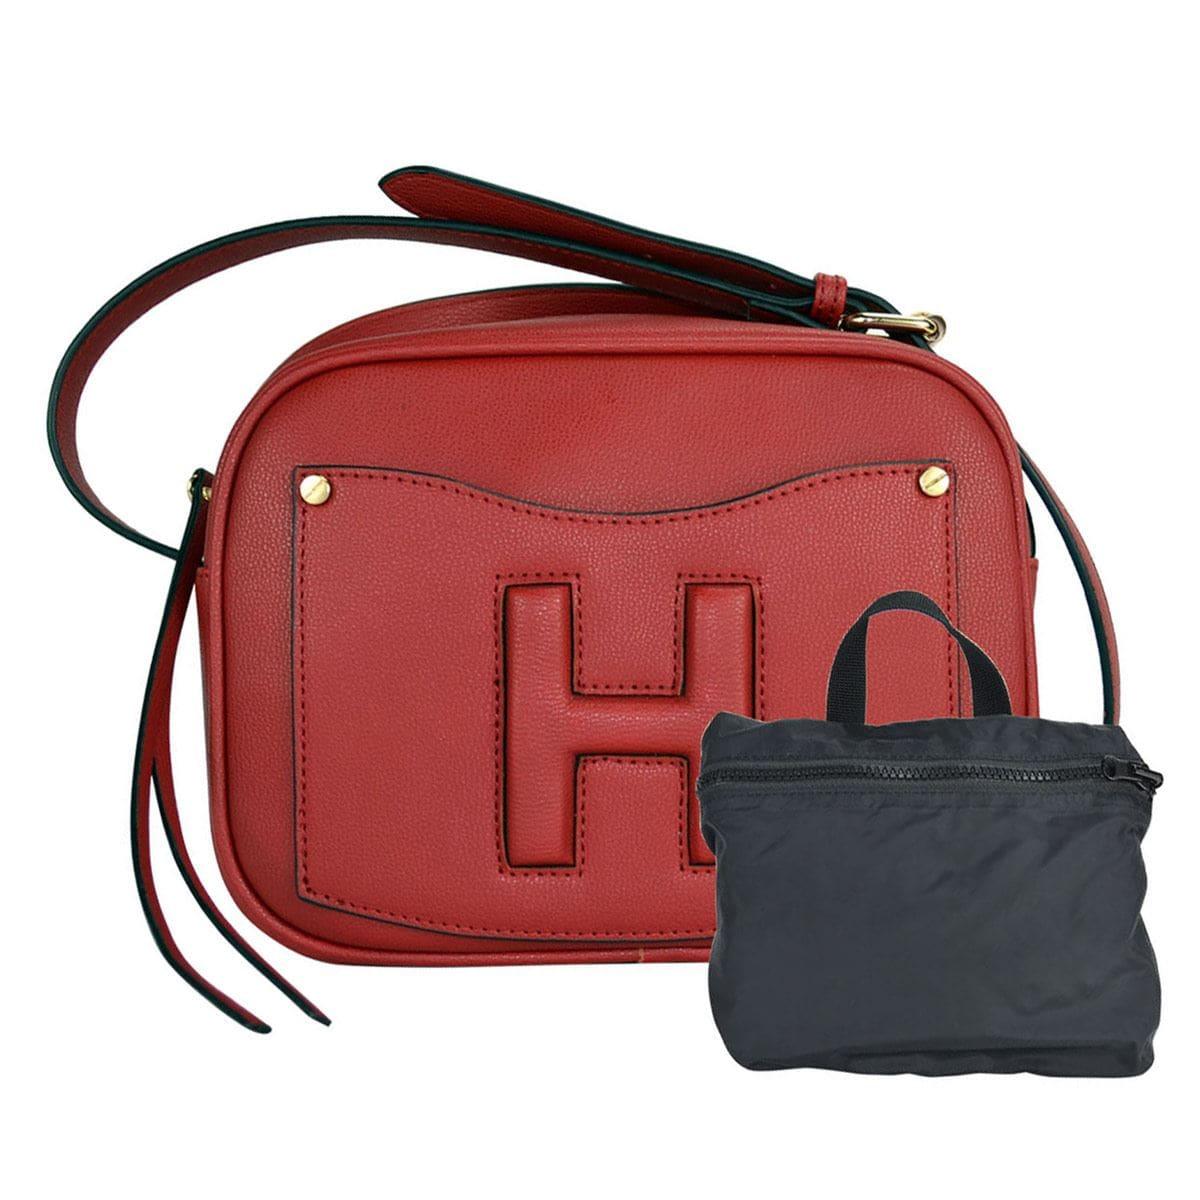 Bolsa Huser Cross Body Chica ModeloSh19302-3 Color Rojo